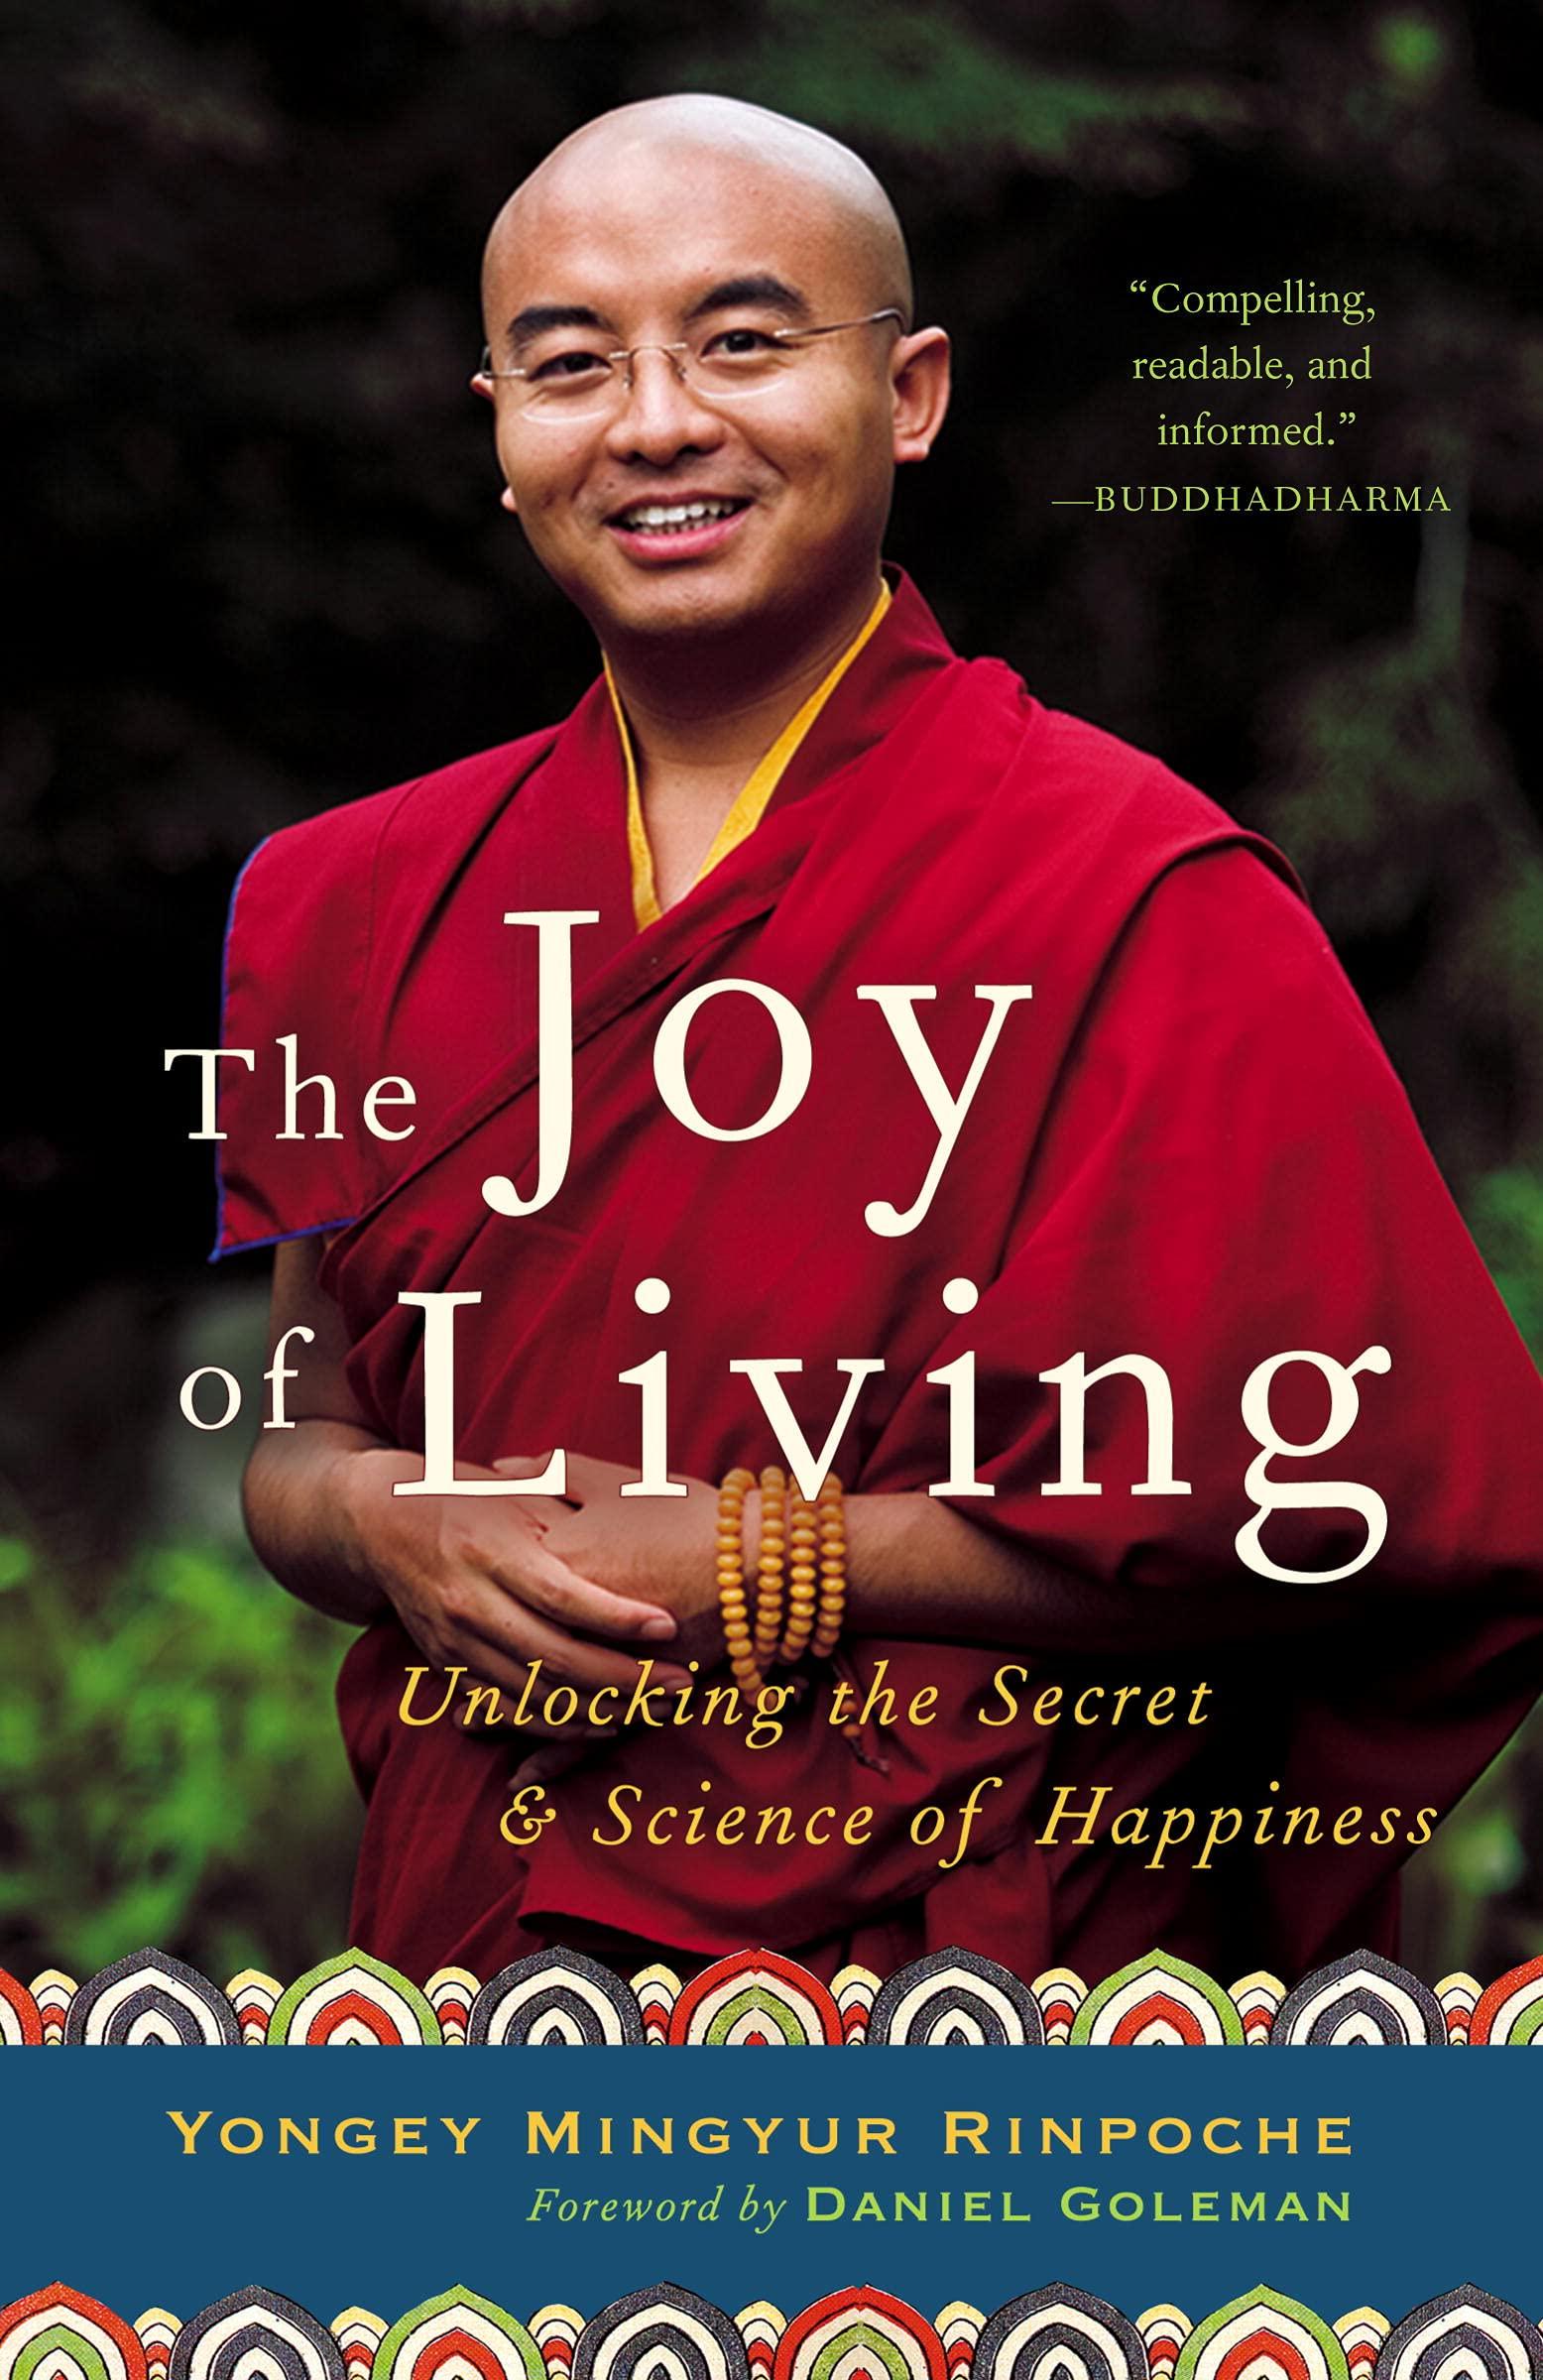 Mingyur Rinpoche - The Joy of Living